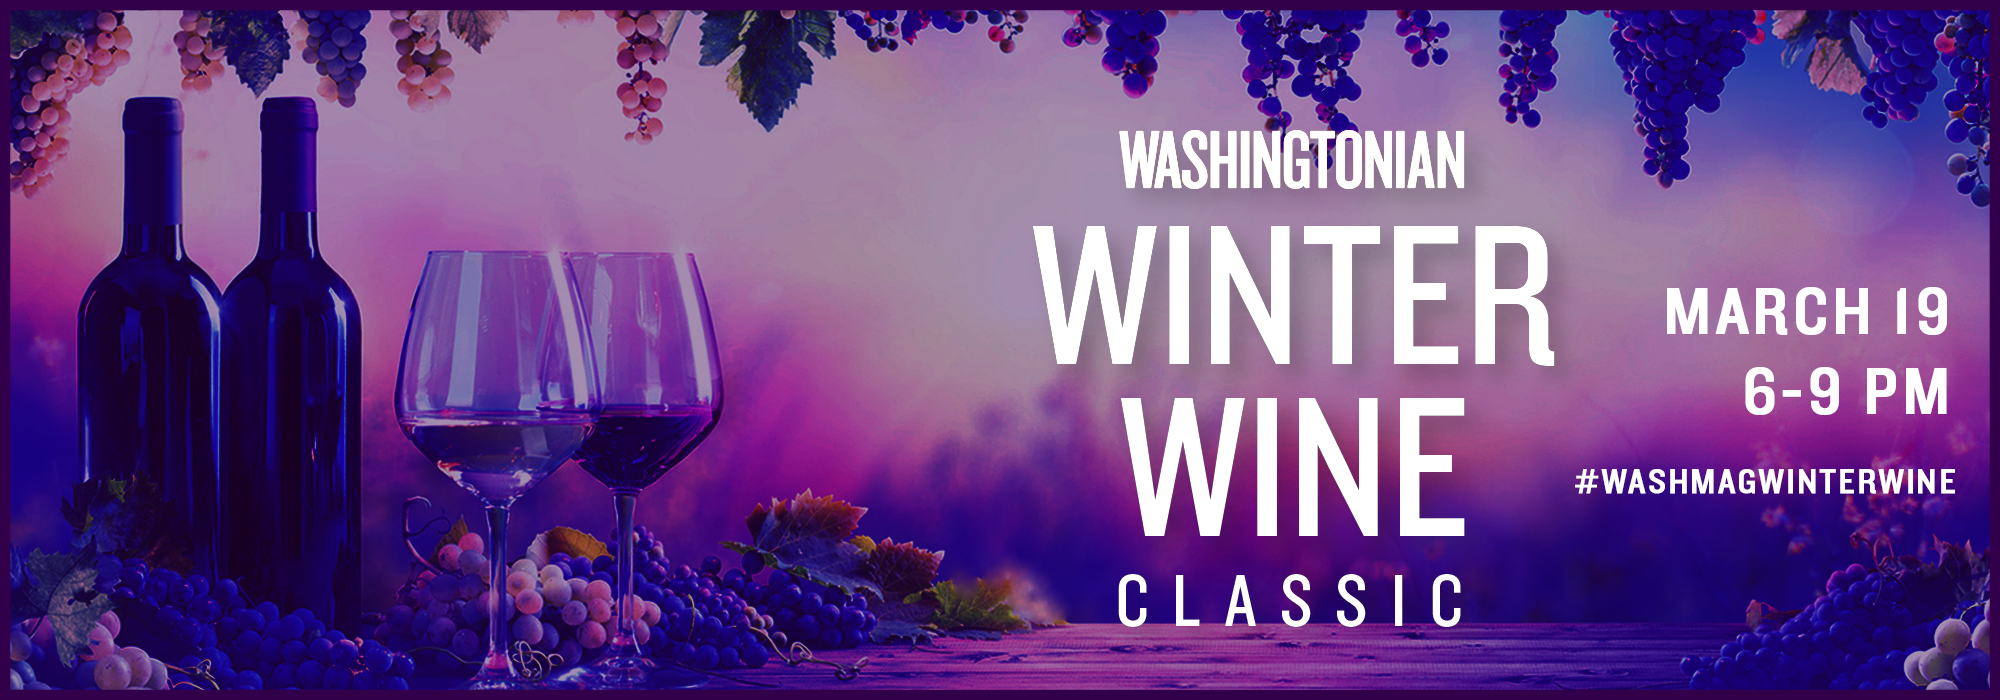 Washingtonian Winter Wine Classic